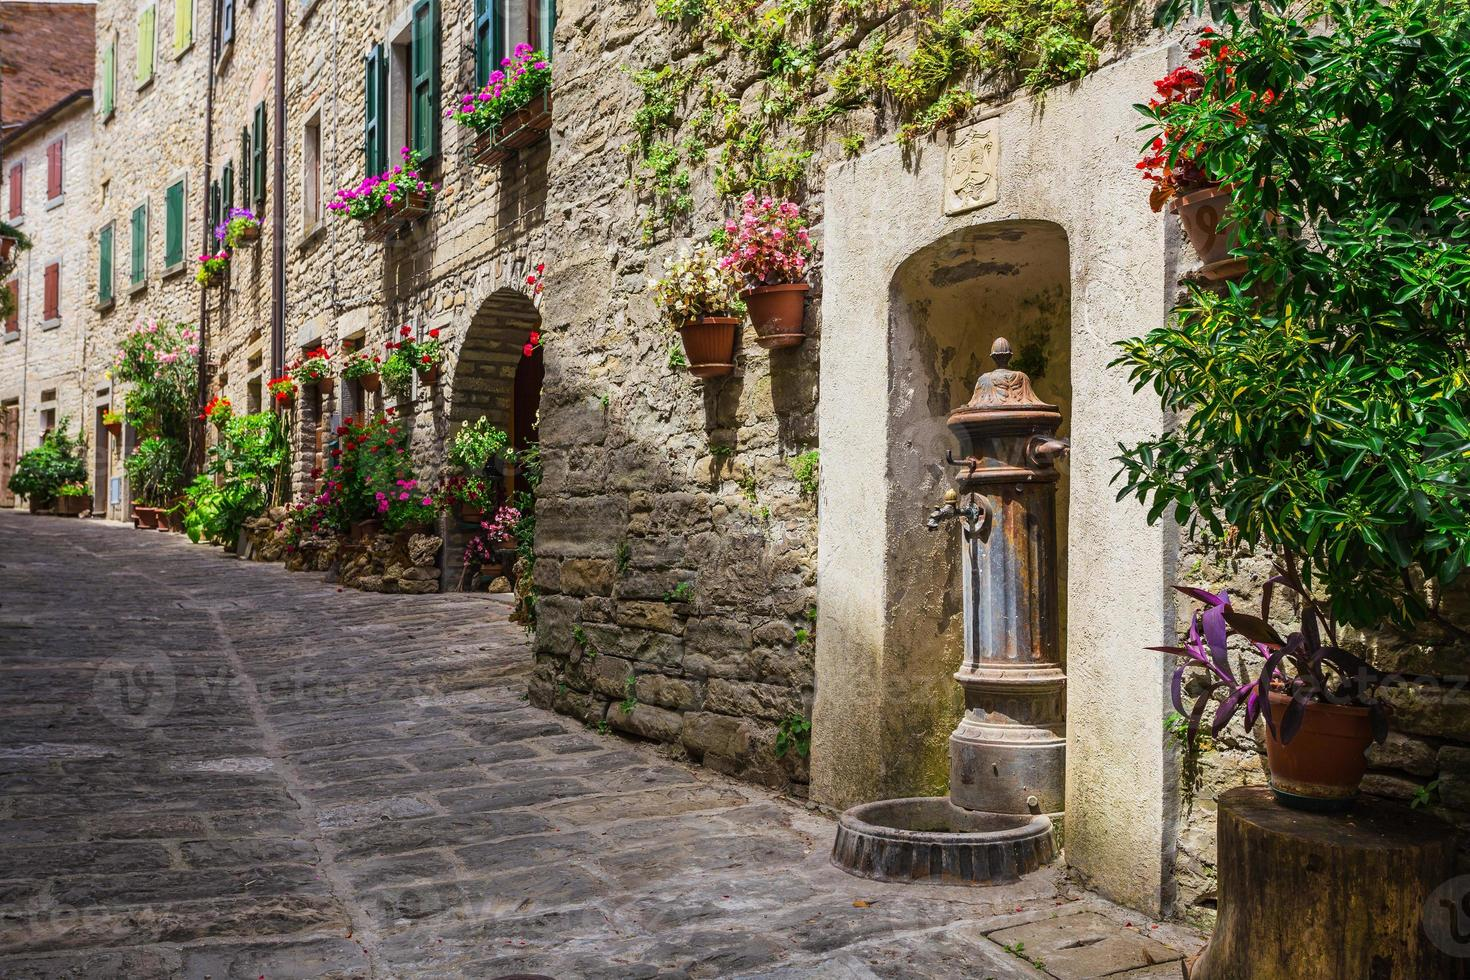 italiensk gata i en liten provins i Toscana foto